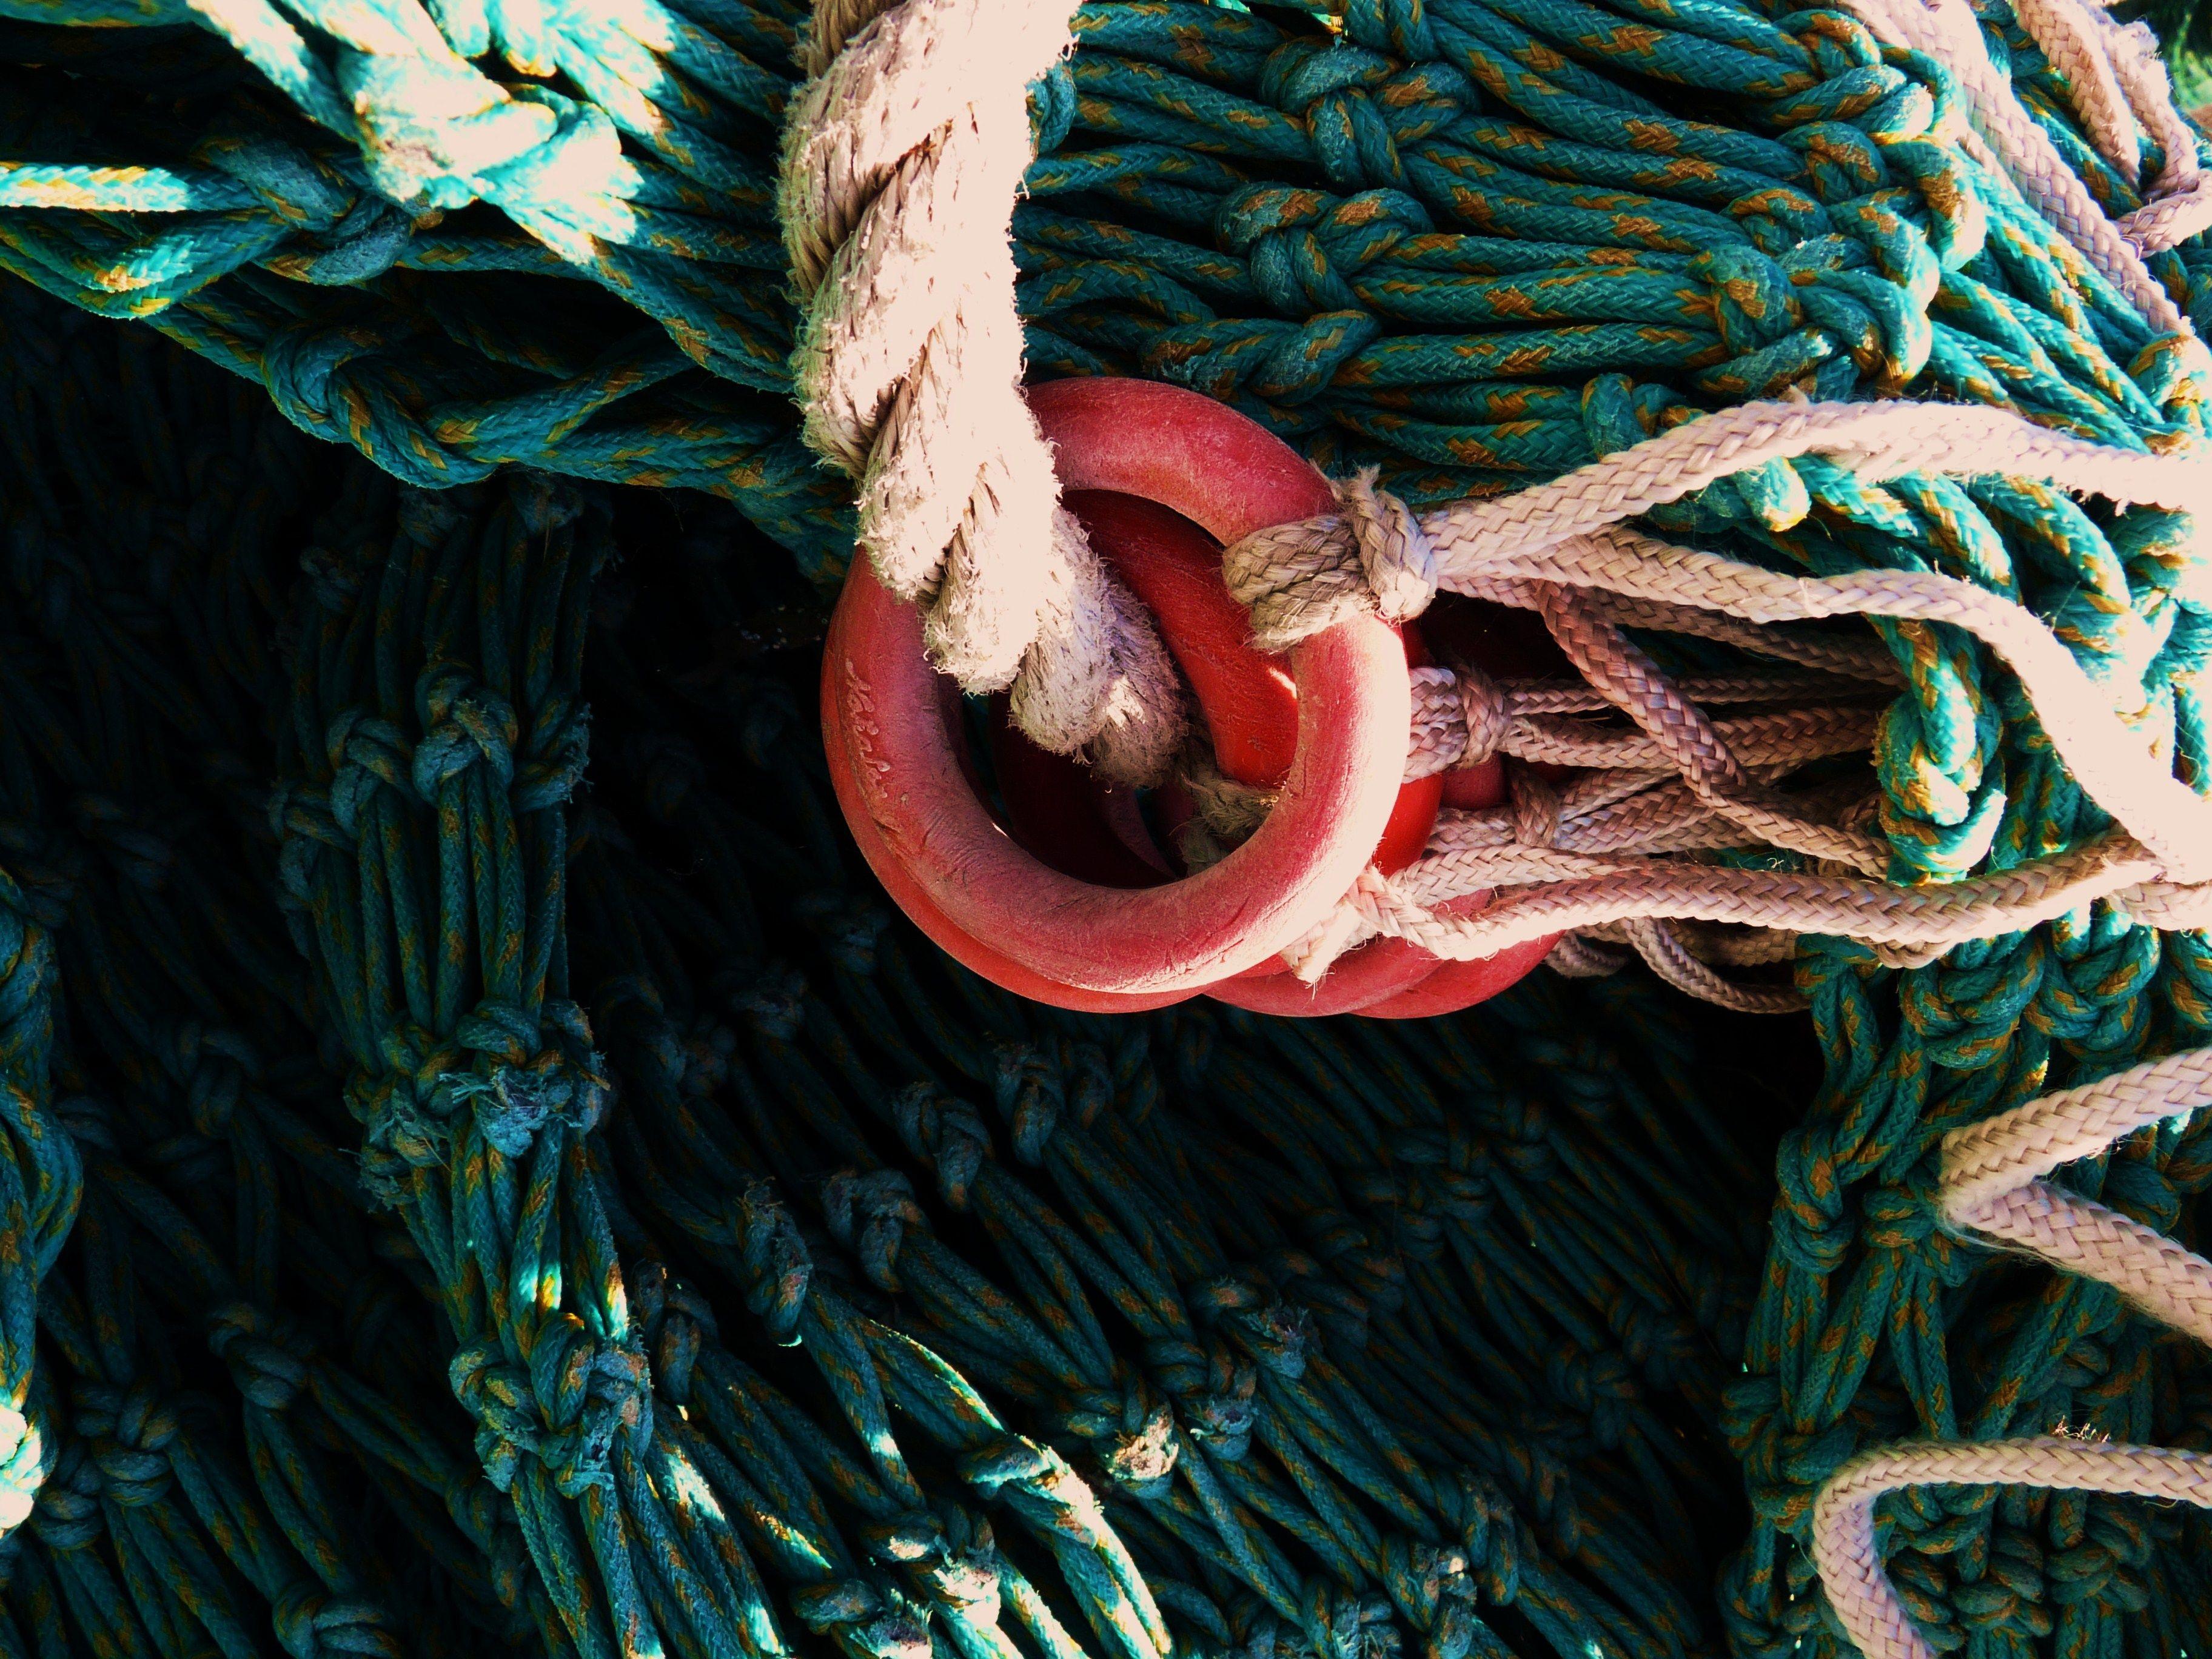 Fishing Nets and Ropes, Denmark